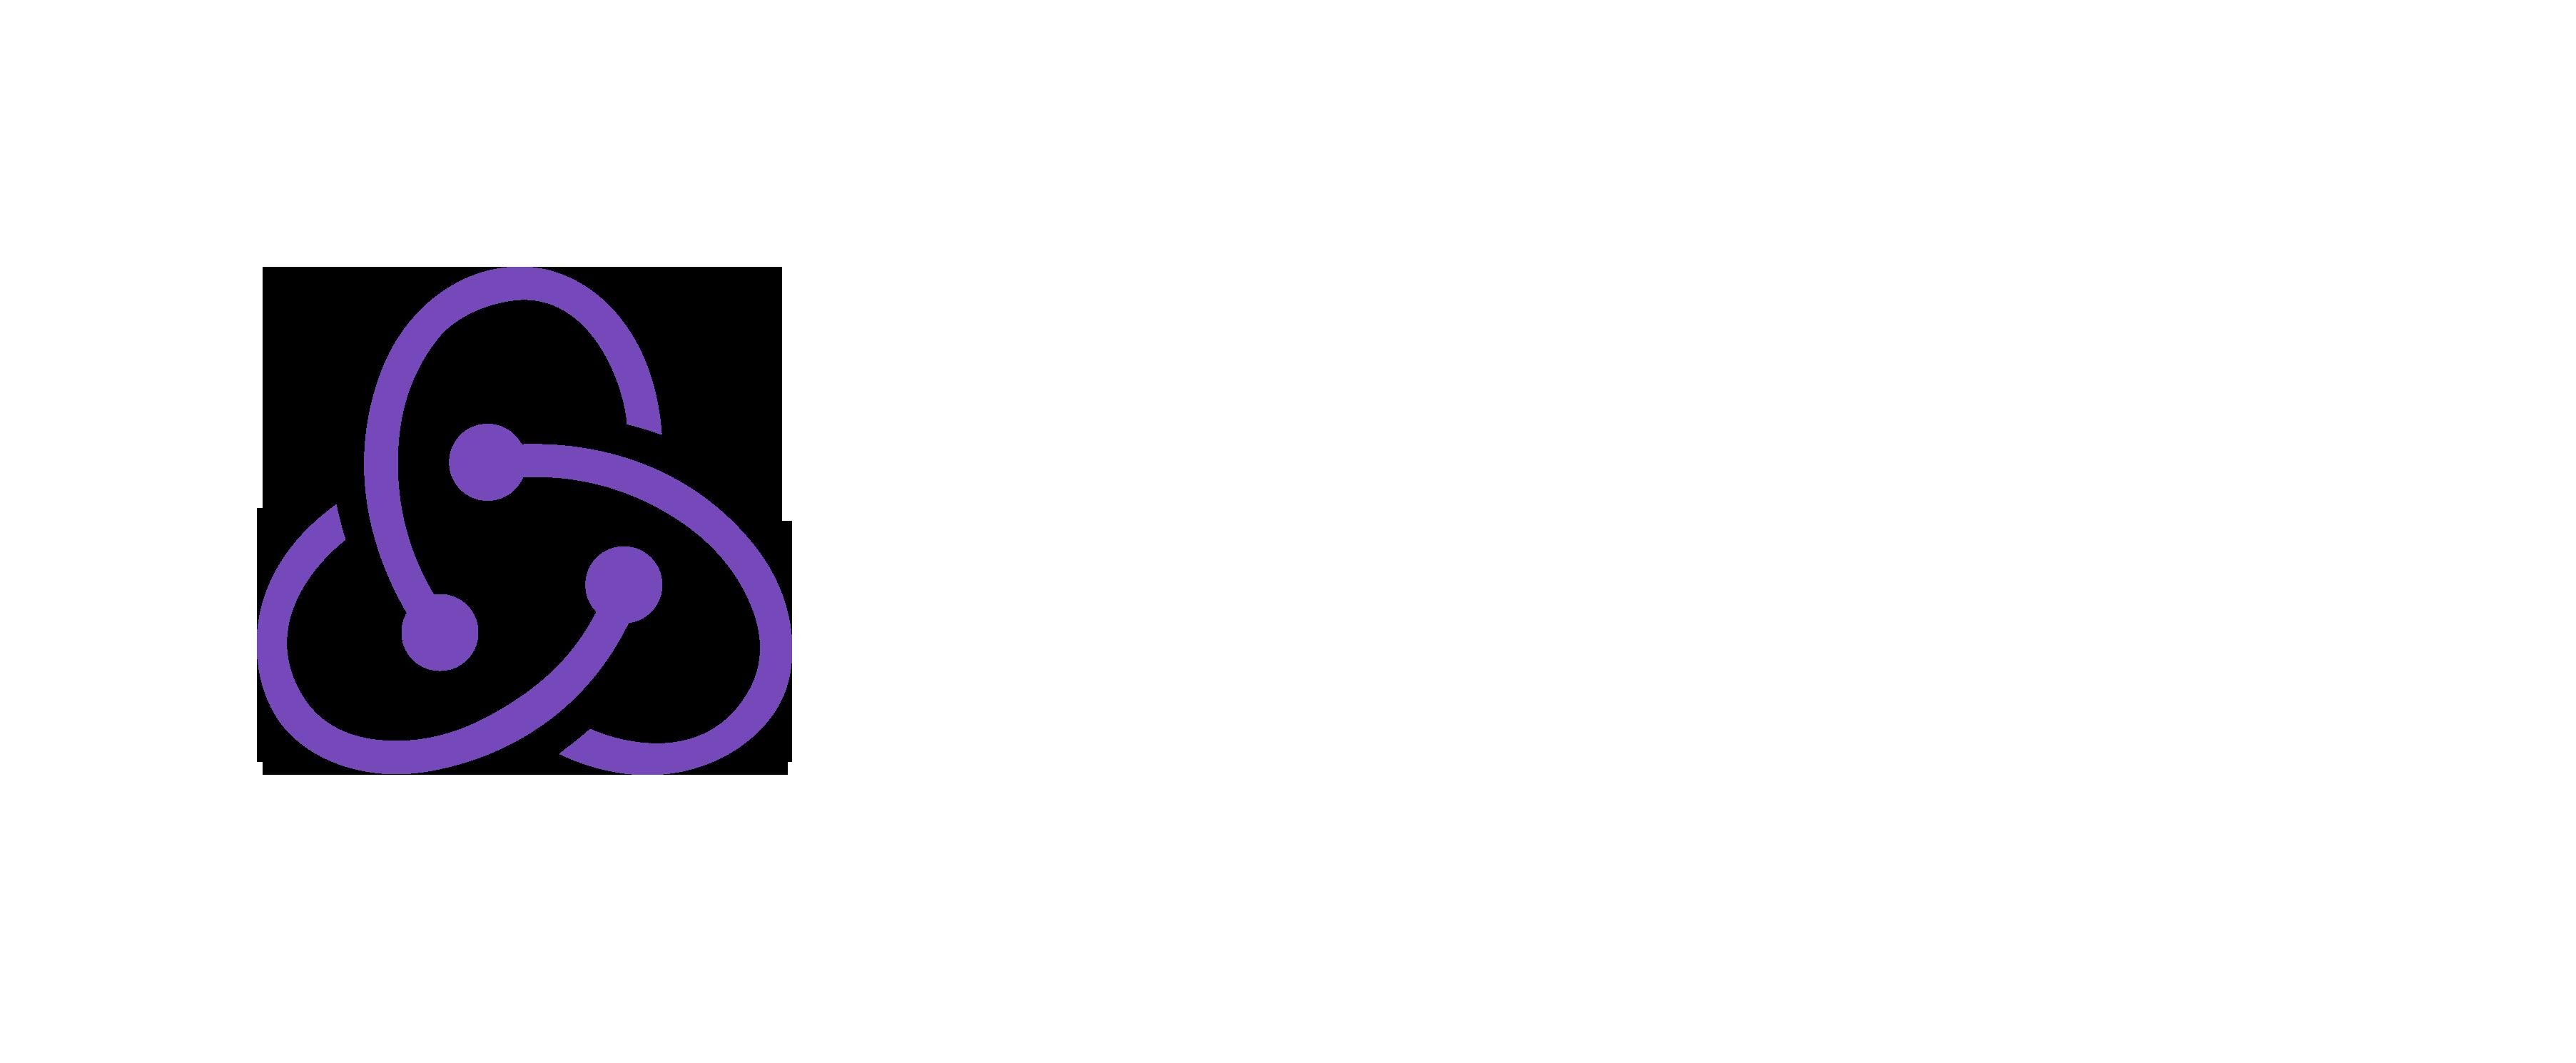 redux/logo at master · reduxjs/redux · GitHub.